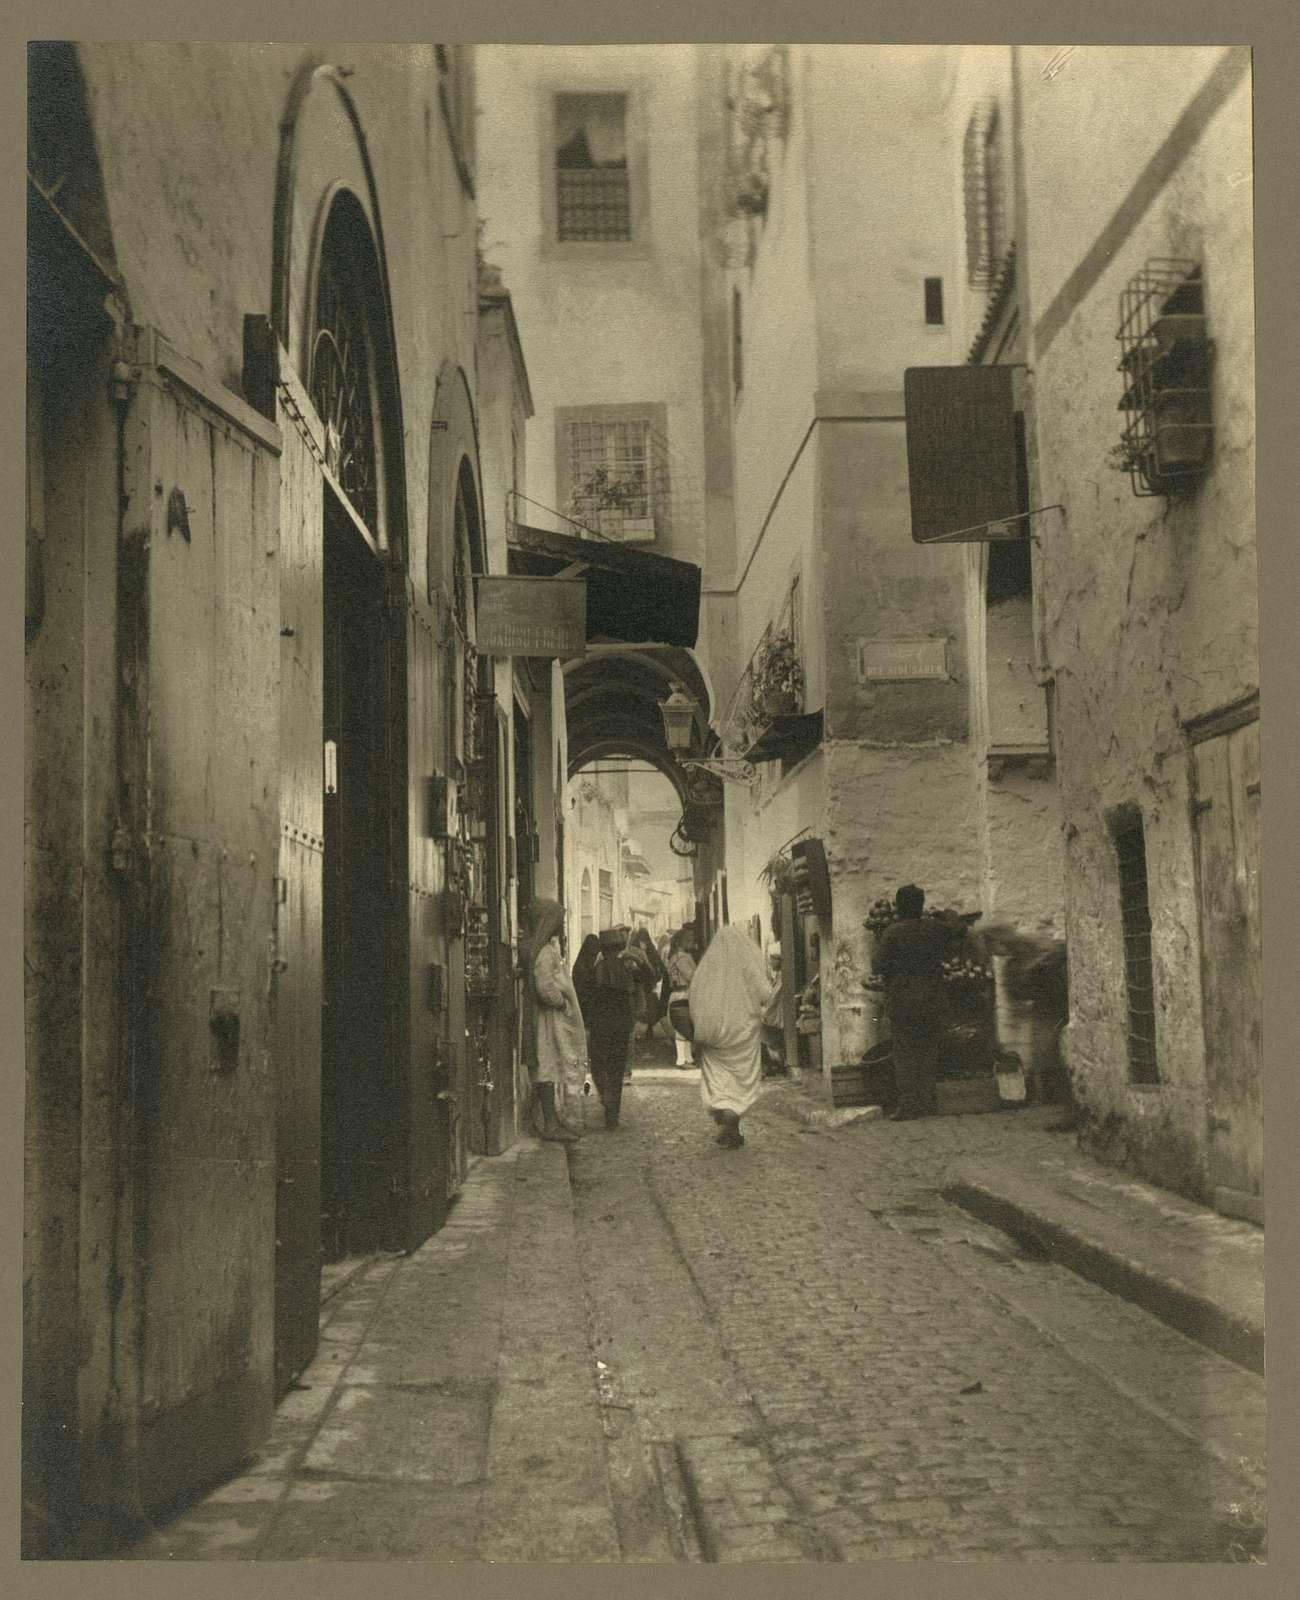 Africa. Tunis. Street scene